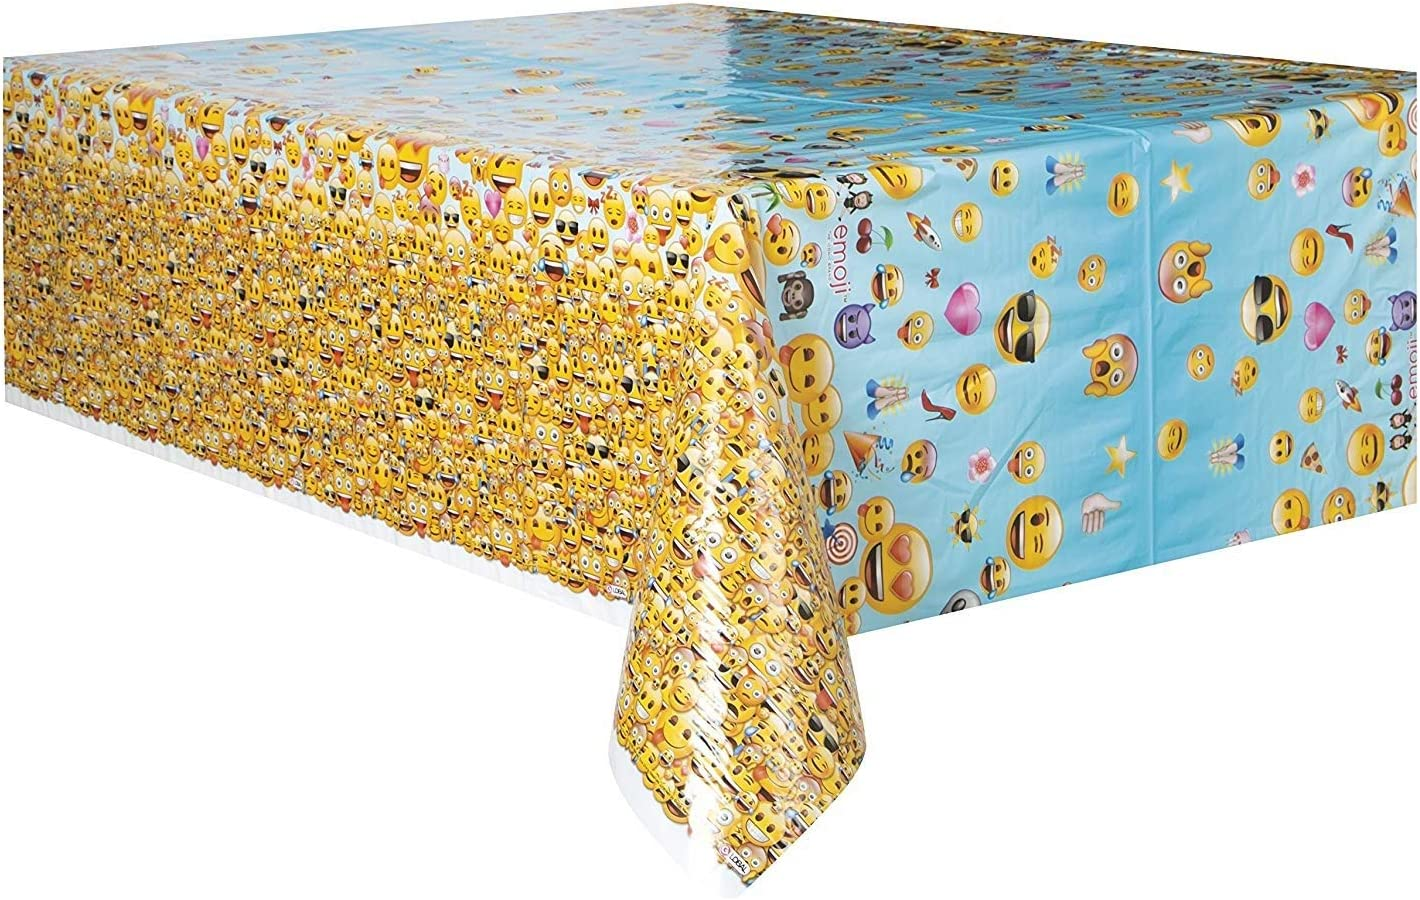 7ft x 4.5ft WOW Plastic Emoji Tablecloth